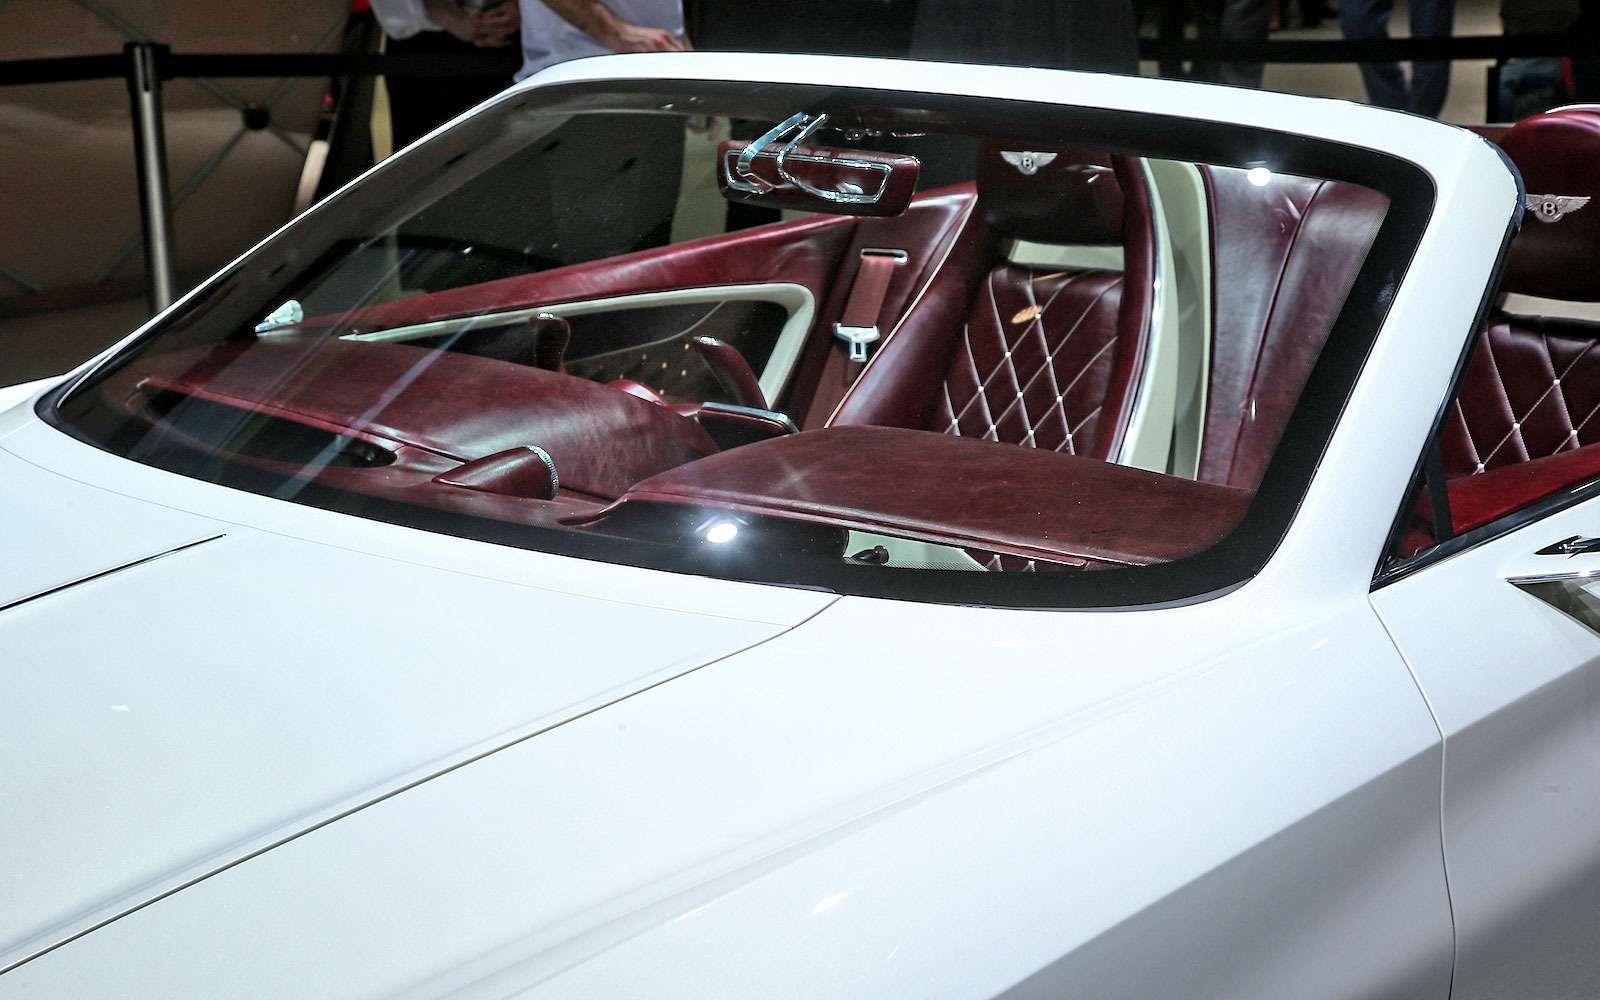 Безвредная красота: Bentley показала родстер EXP 12Speed 6e— фото 718273